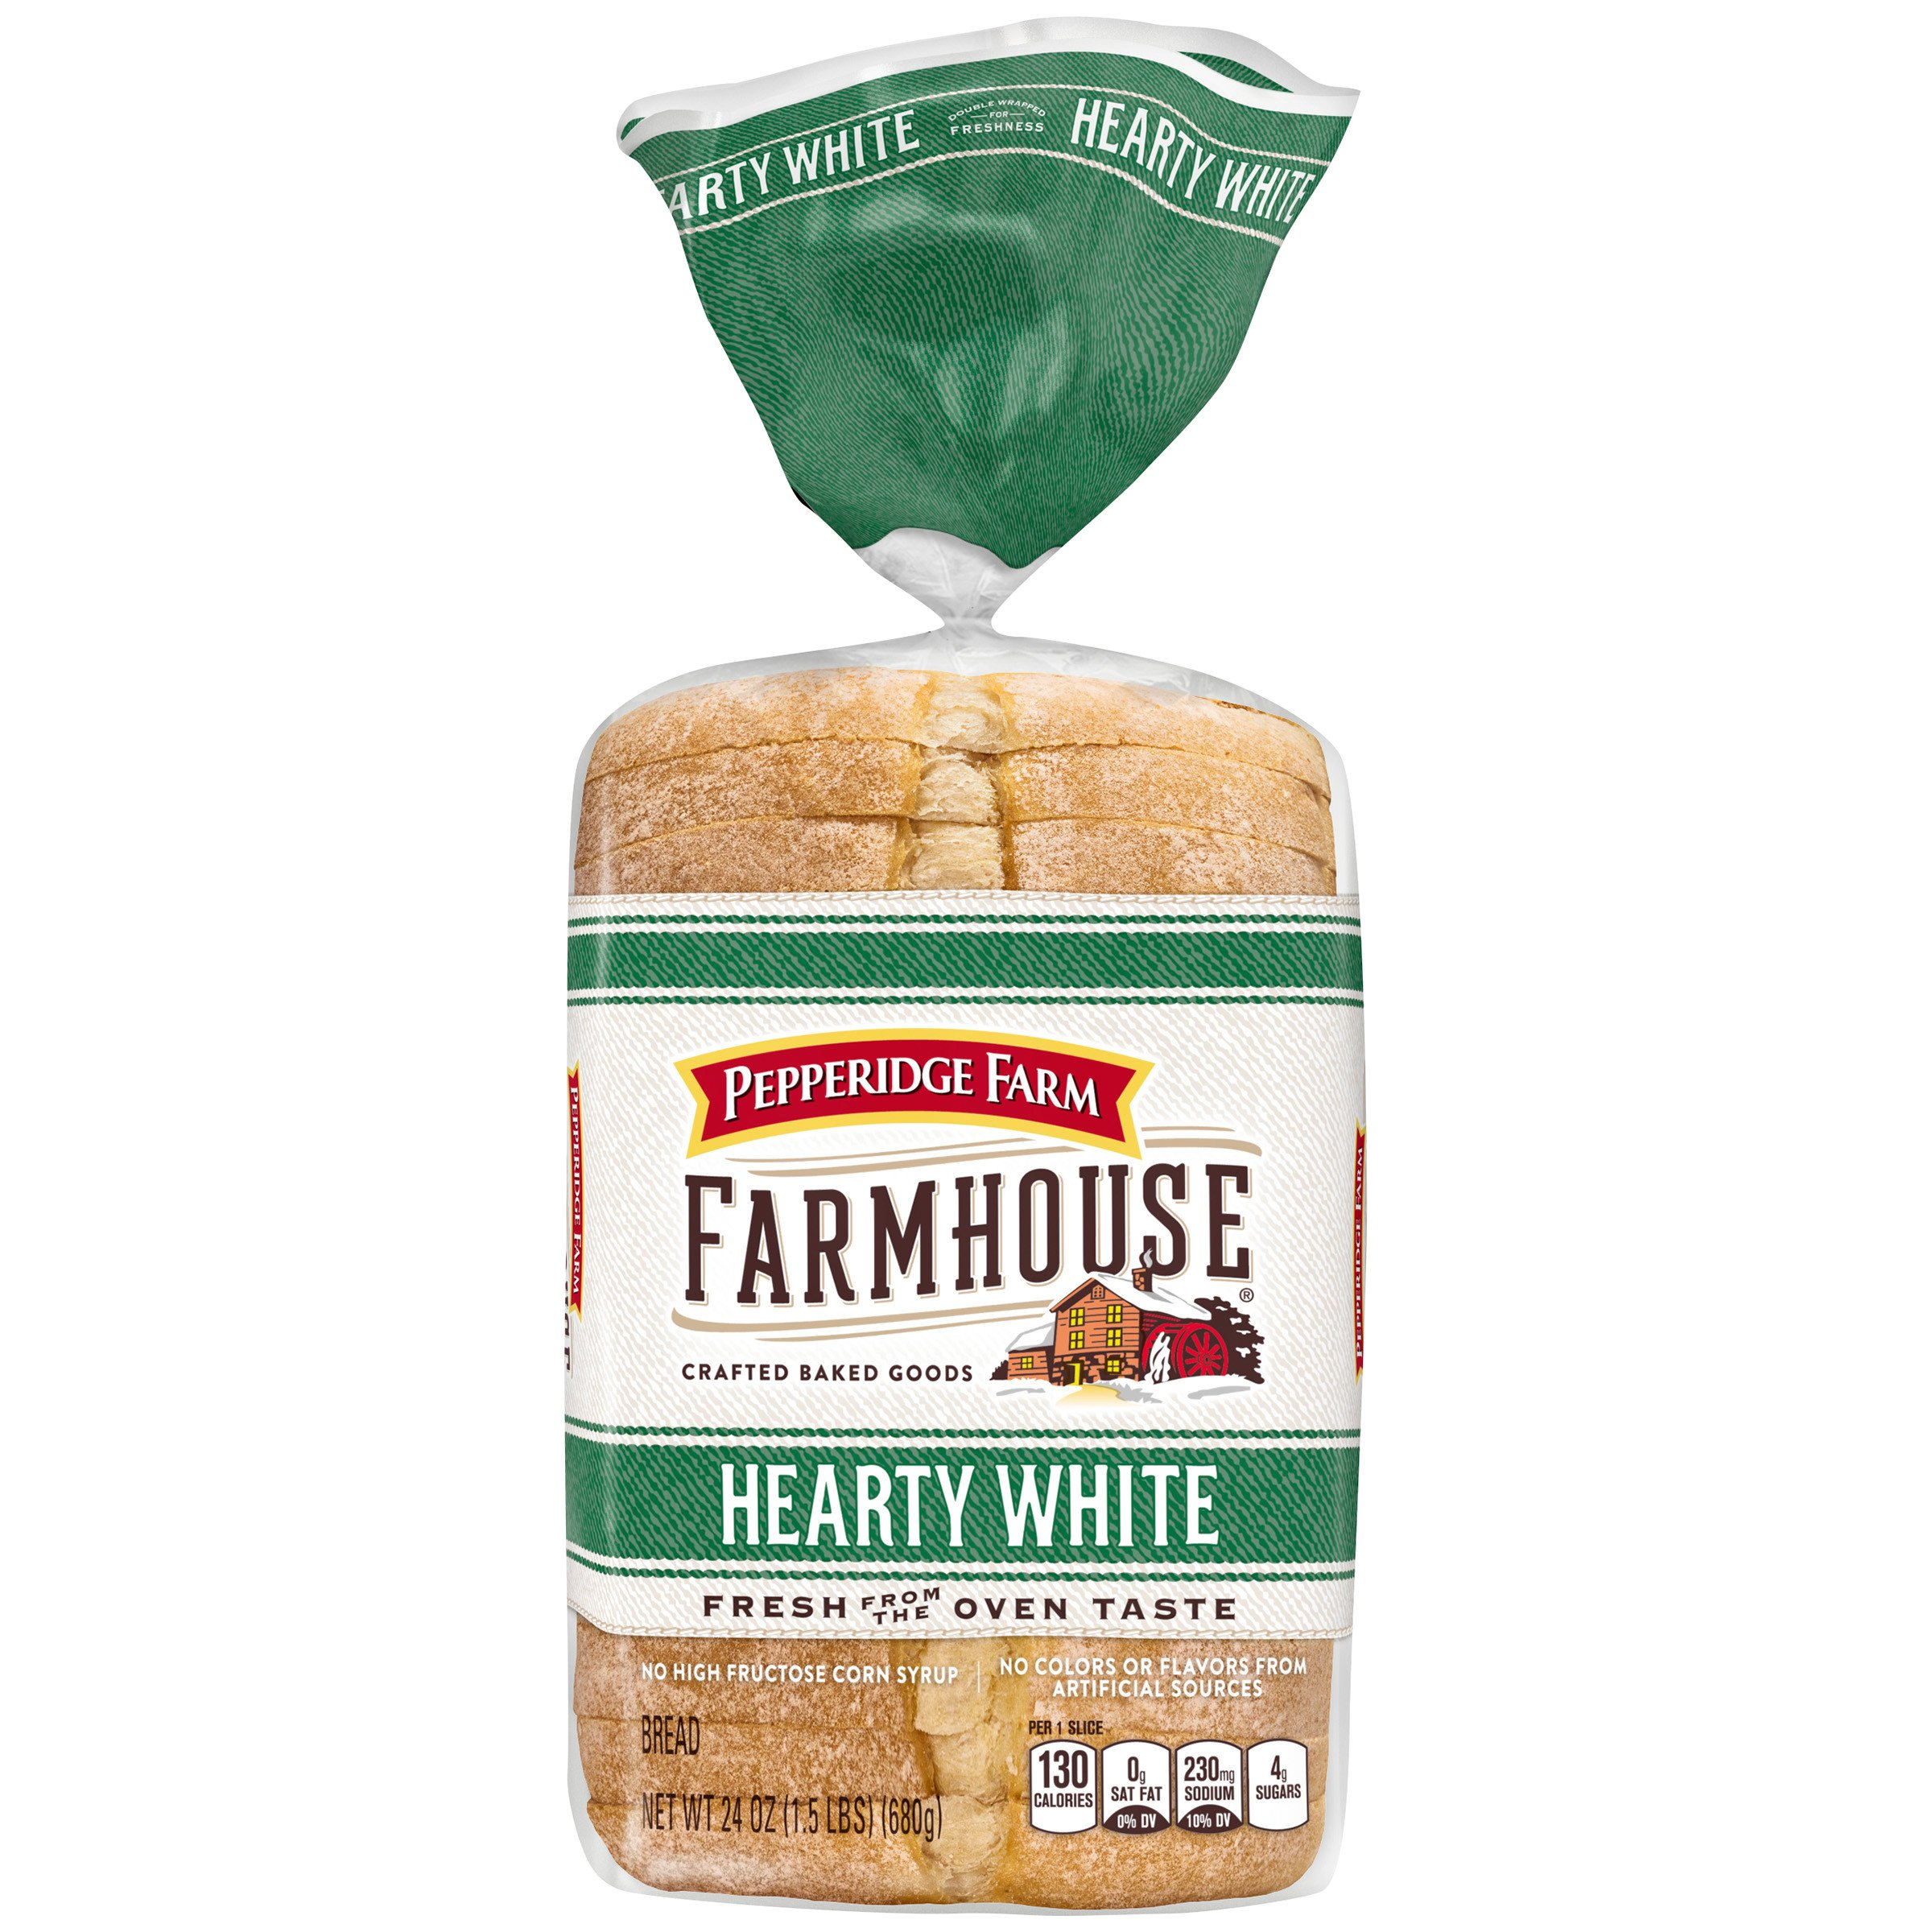 Pepperidge Farm Farmhouse Hearty White Sandwich Bread, 24 oz